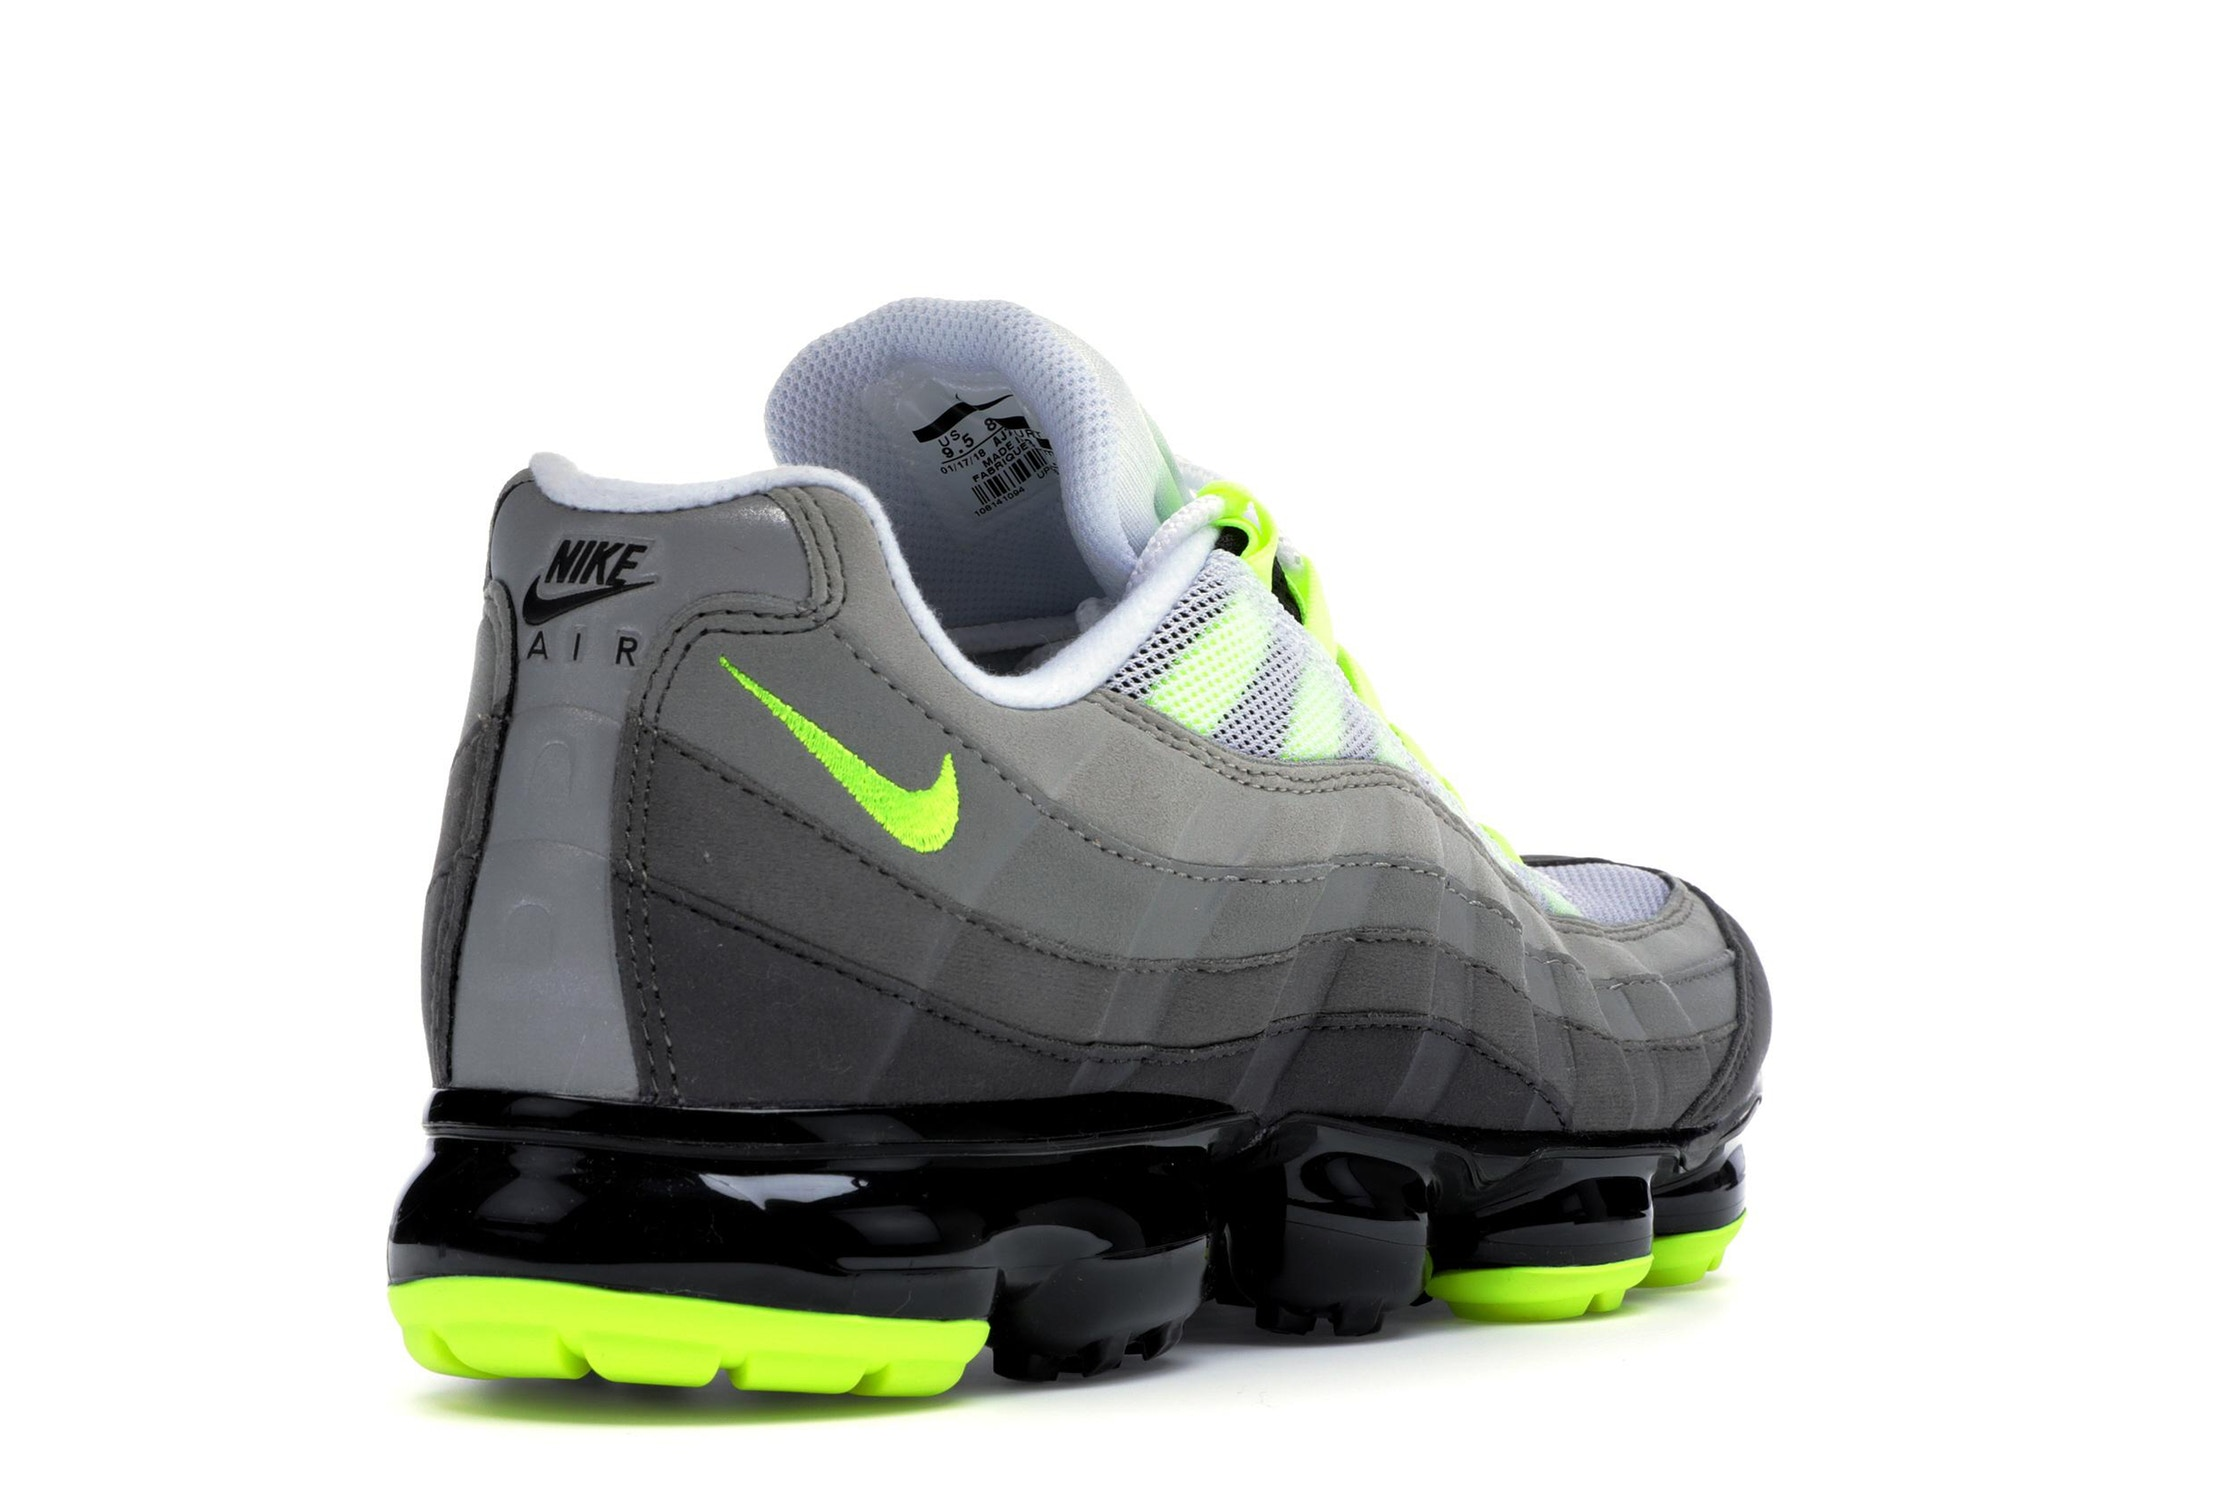 b77c86be32 Kick Avenue - Authentic Sneakers